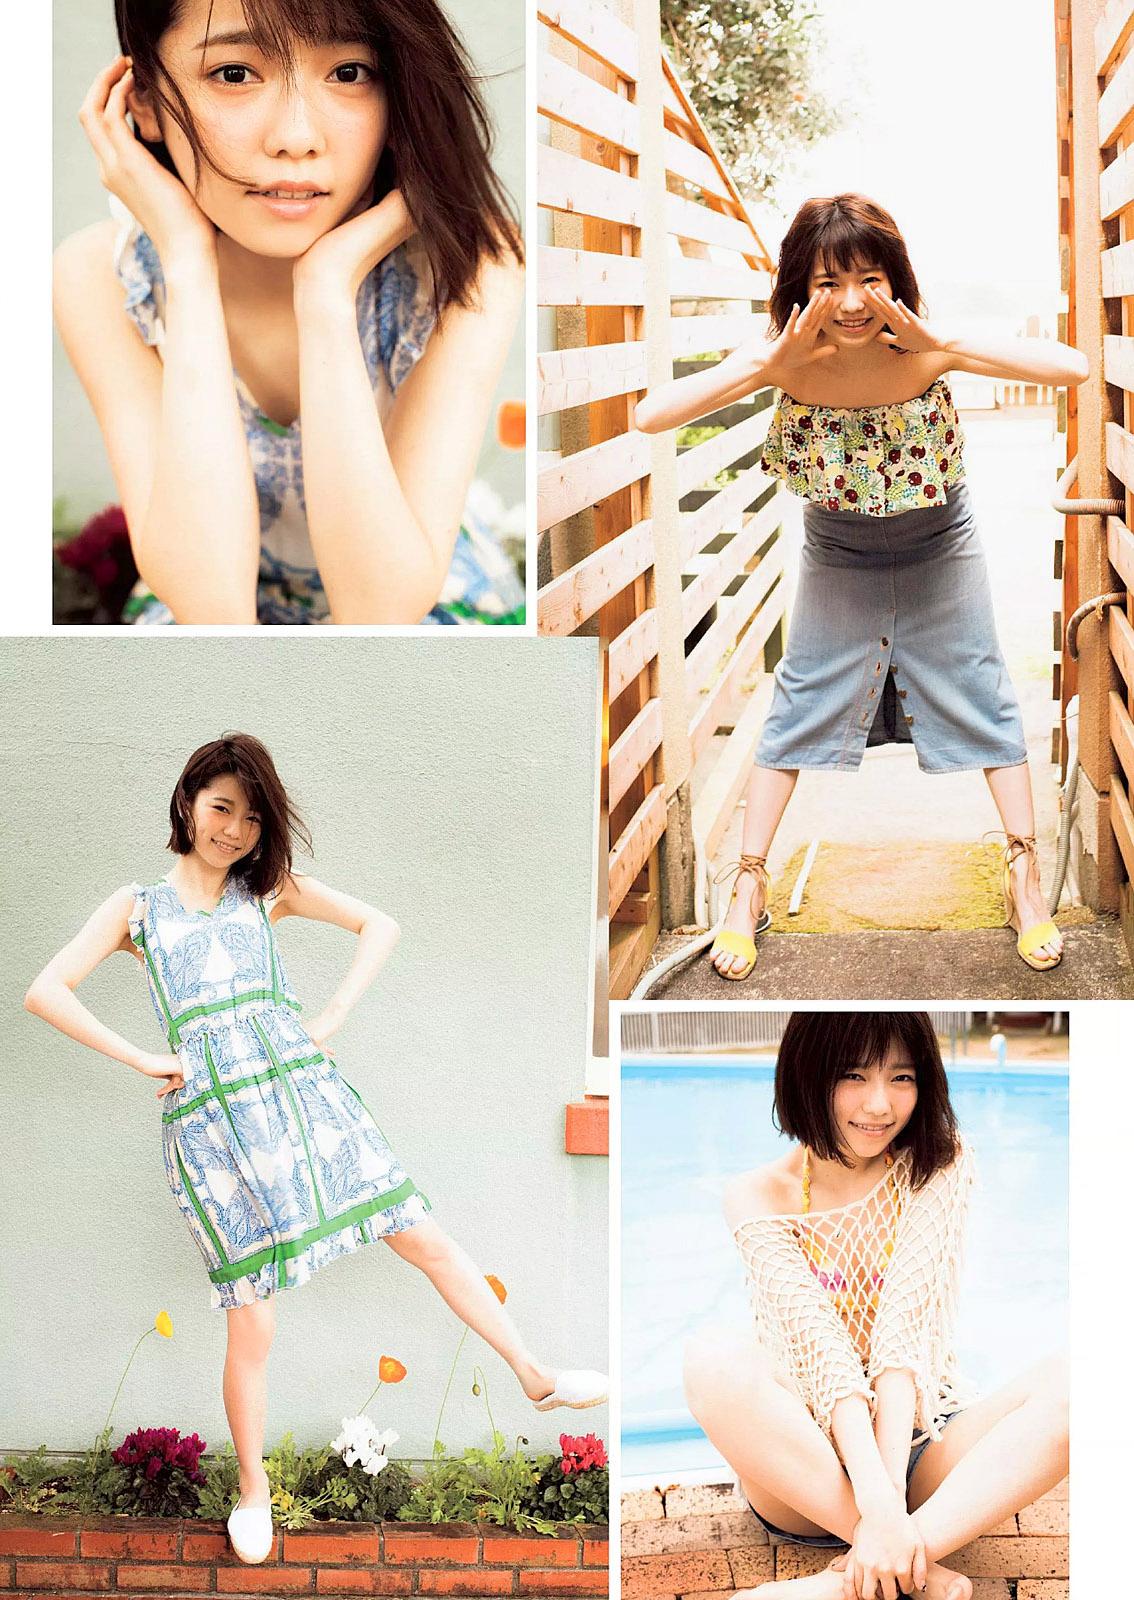 HShimazaki WPB 150615 05.jpg